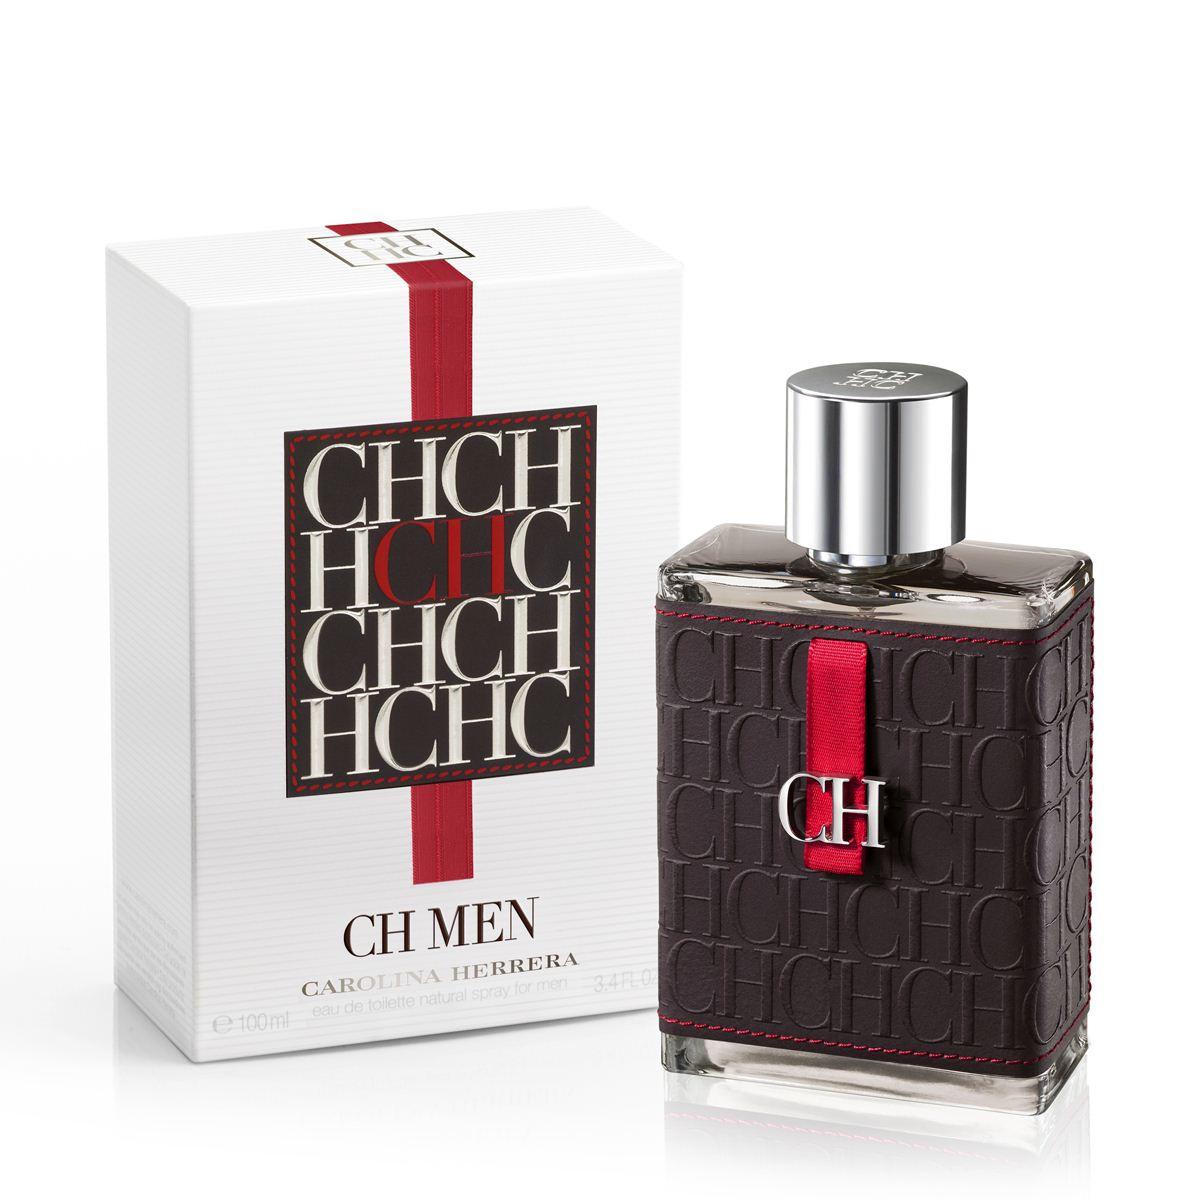 Perfume Masculino Ch Hc Men Carolina Herrera Eau de Toilette 100ml - Evas  Perfumaria a1d3d79c0a